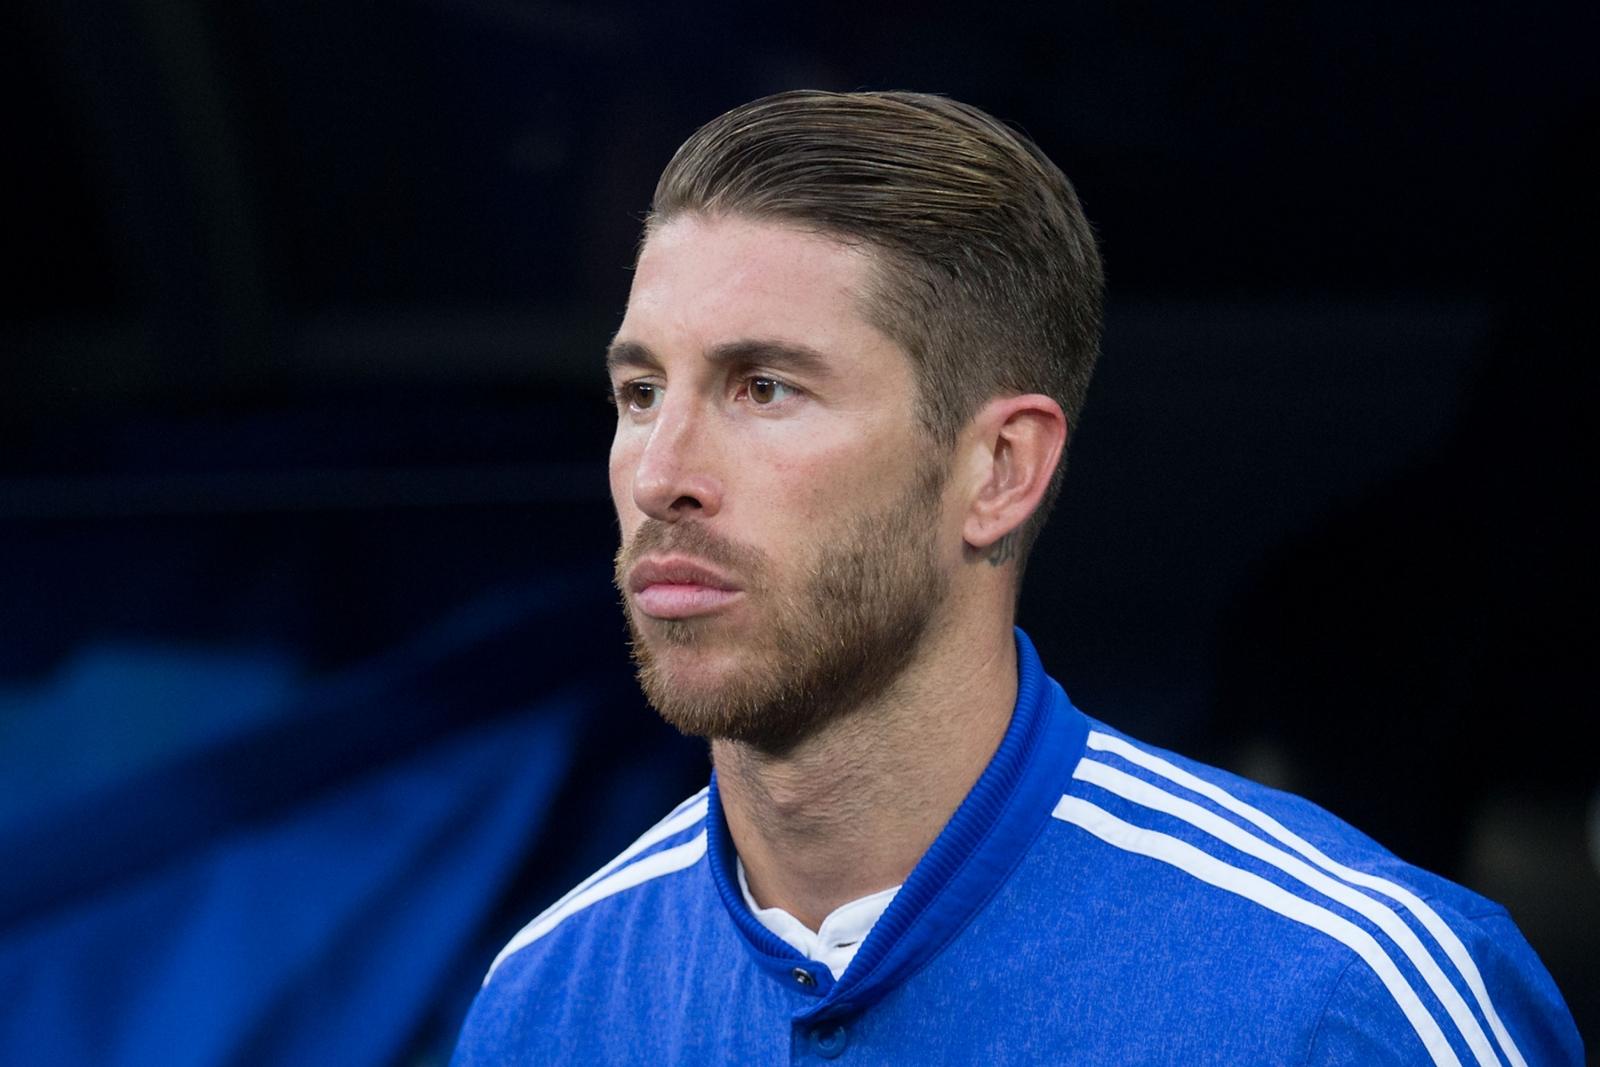 Sergio Ramos Modric